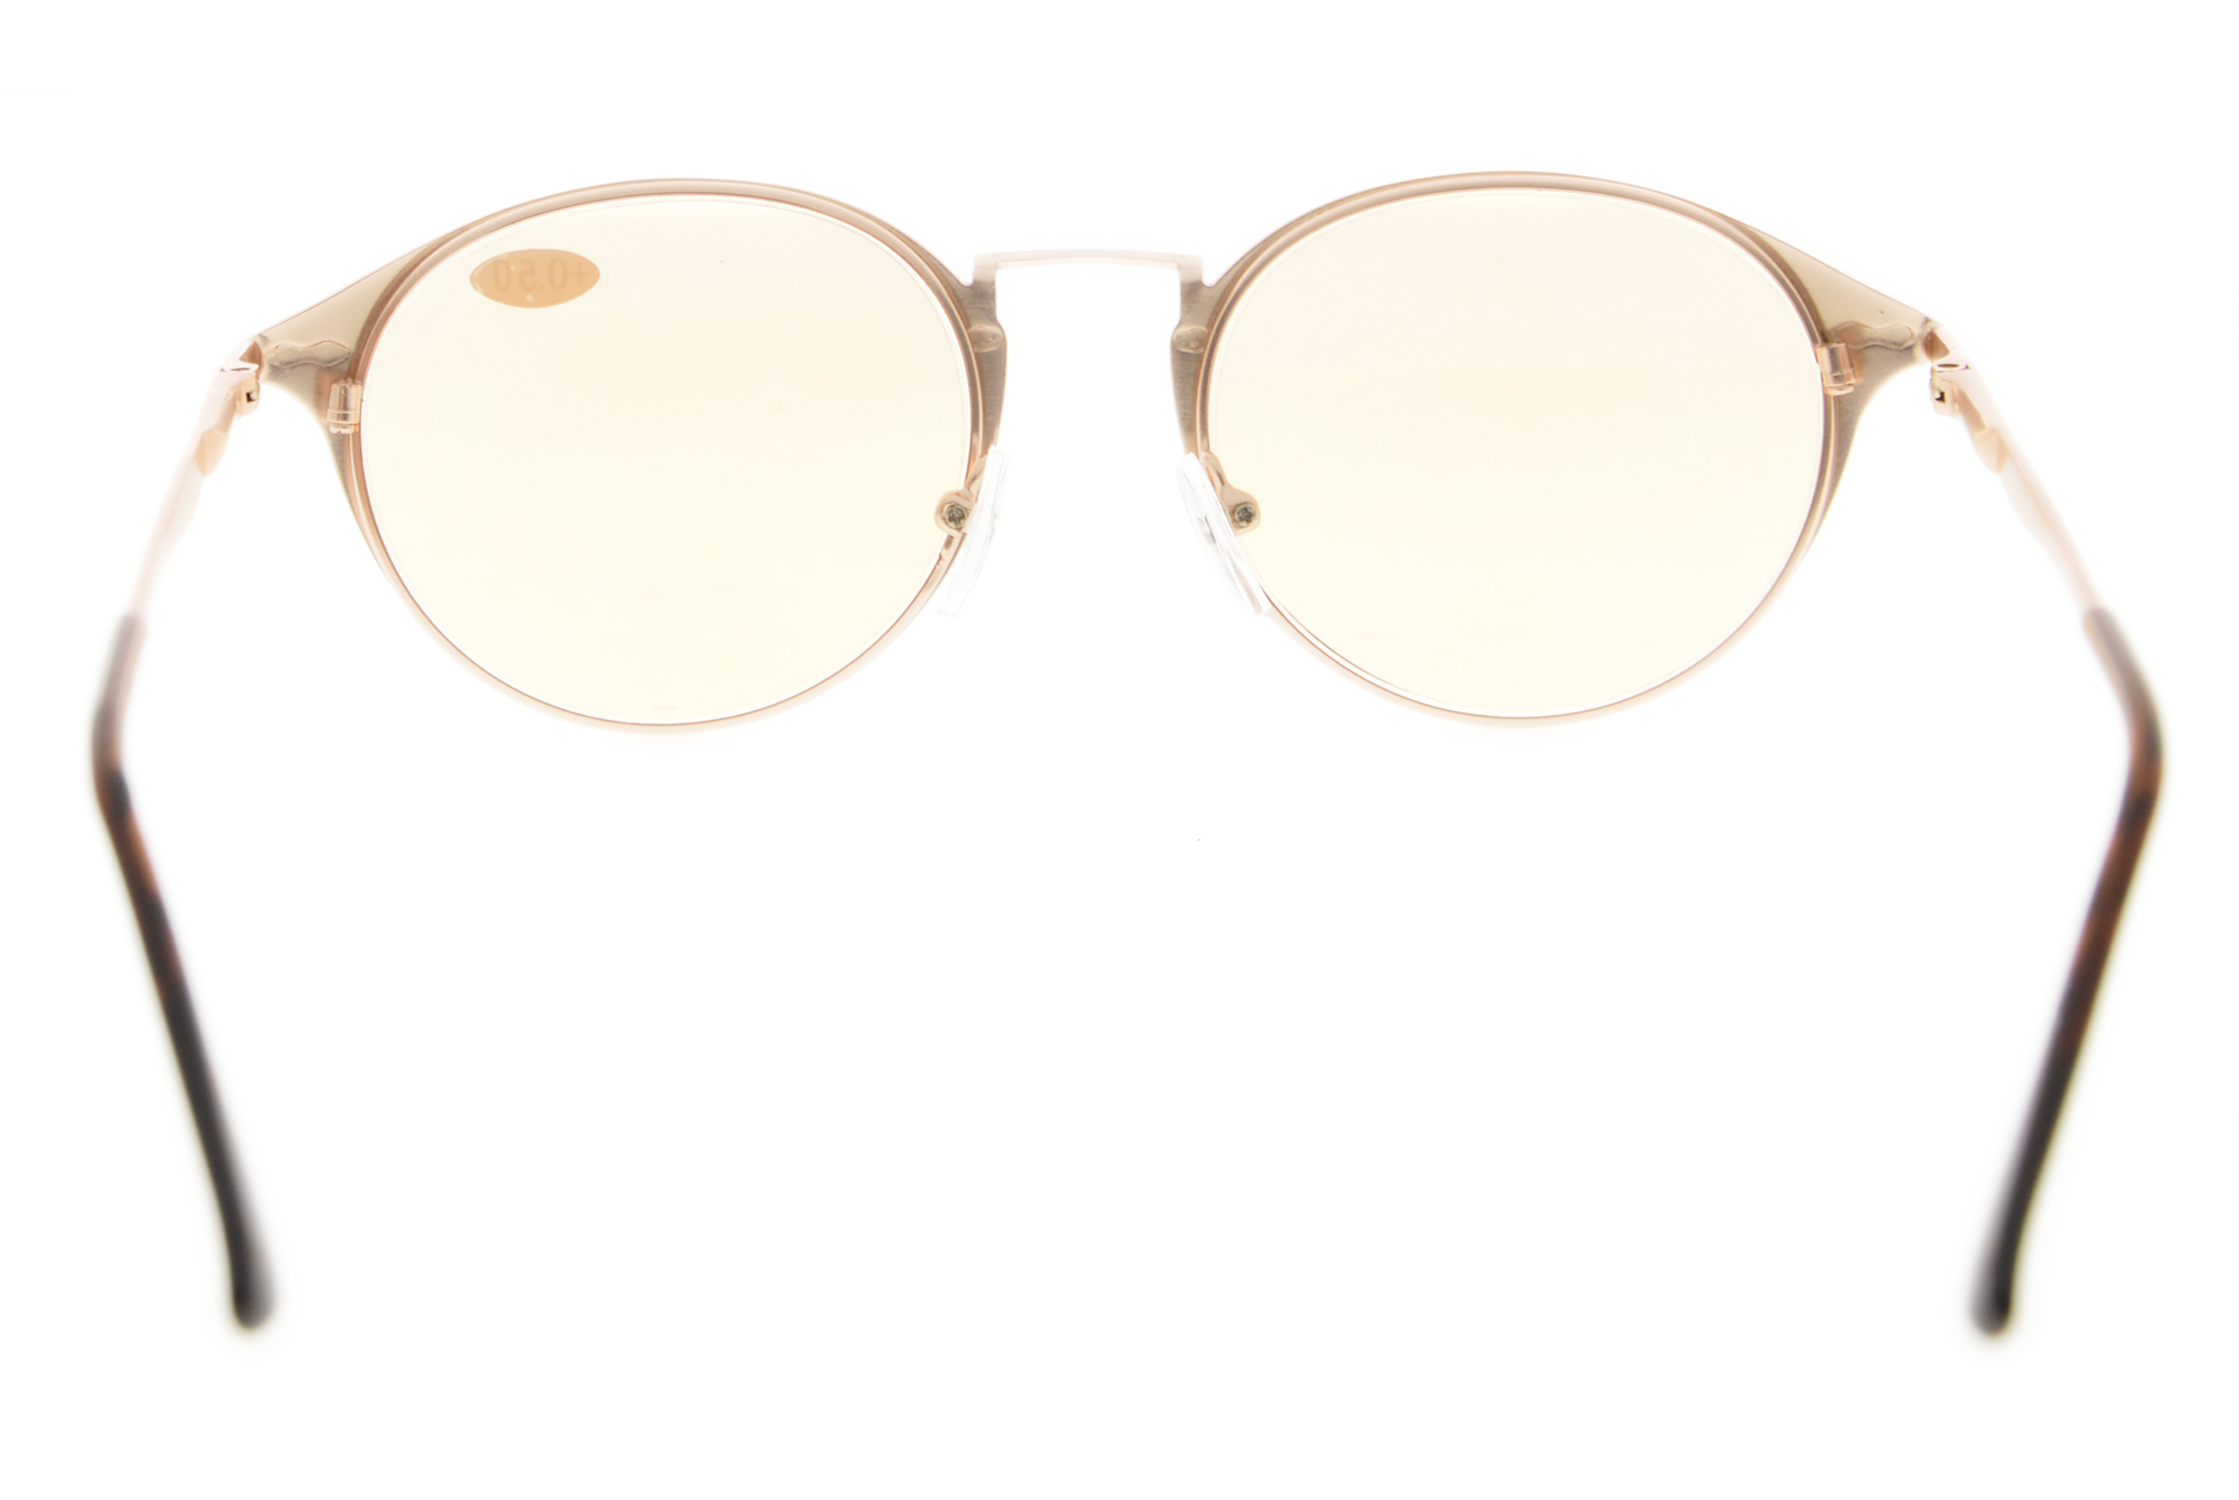 136973068649 Eyekepper Computer Reading Glasses UV Protection Retro Round Tinted Lens  Quality Spring Hinge CG1640